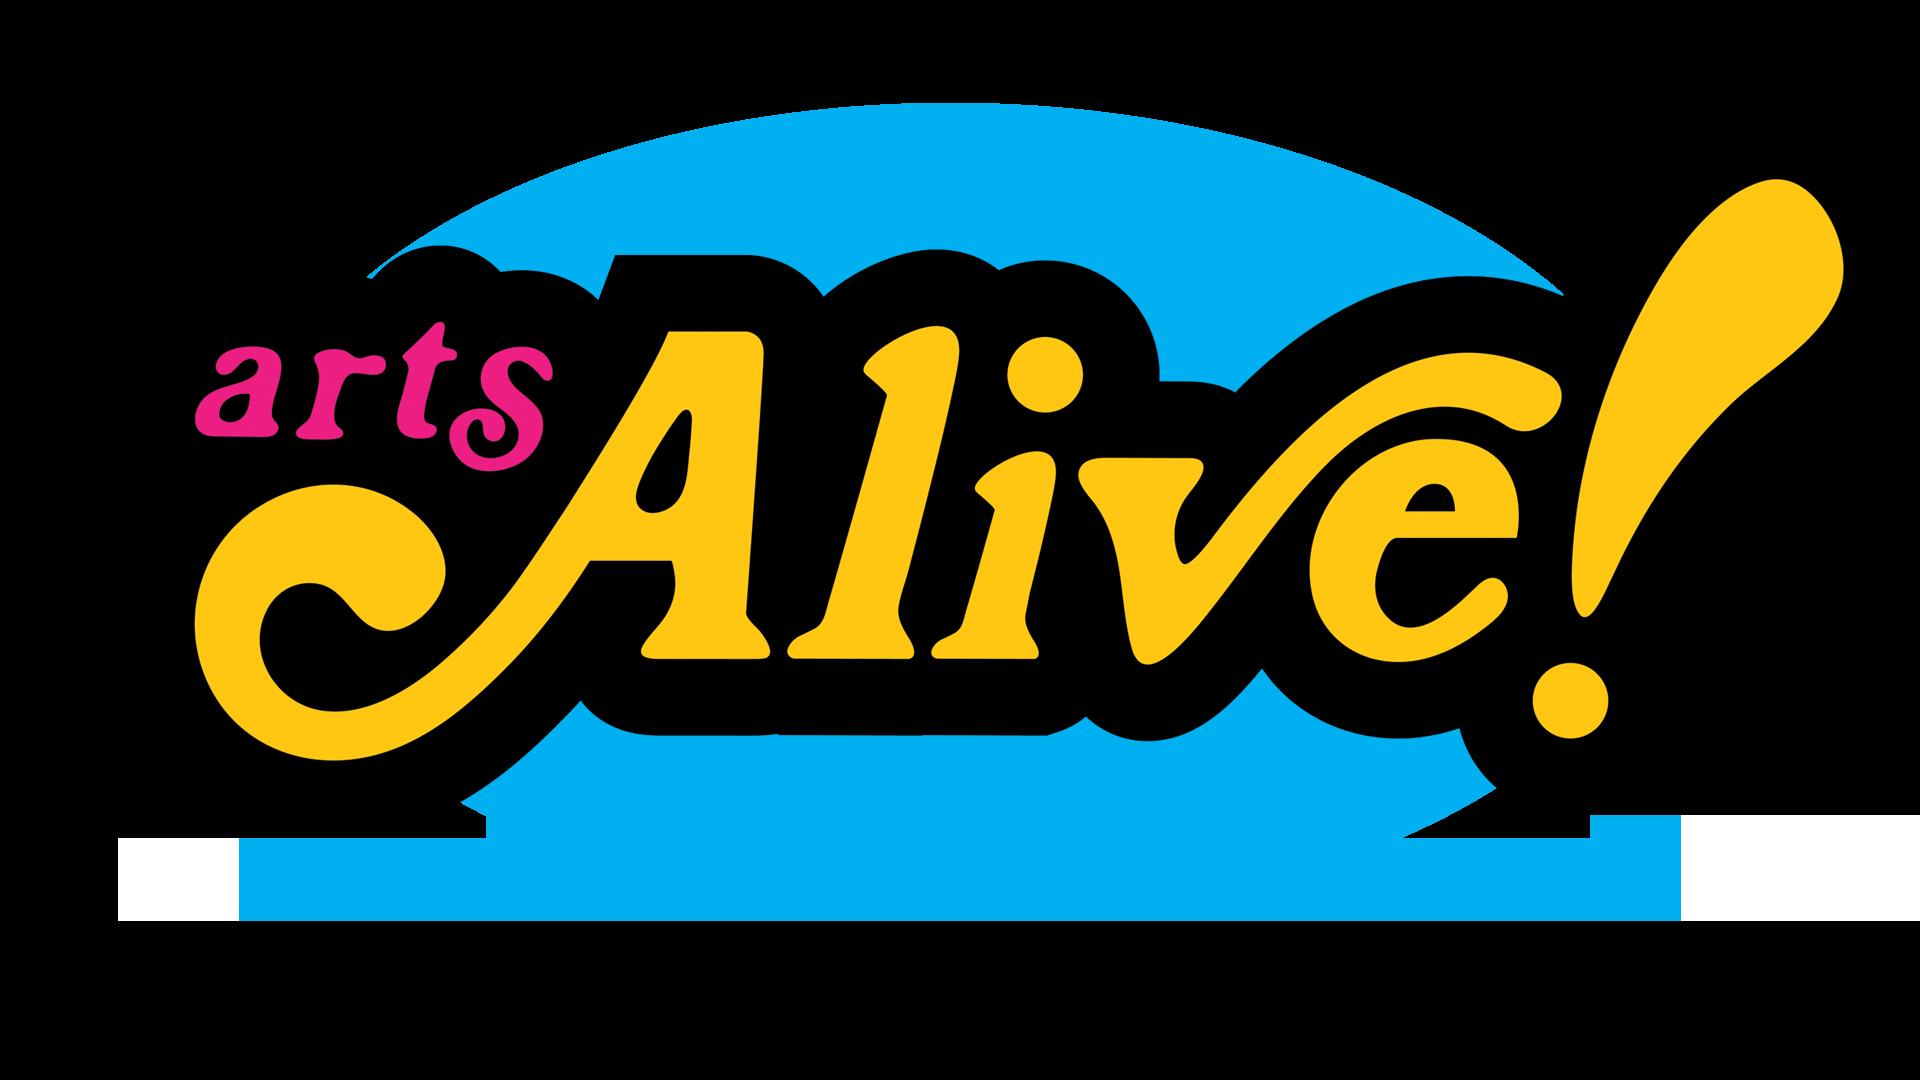 Arts Alive! Inc. Education